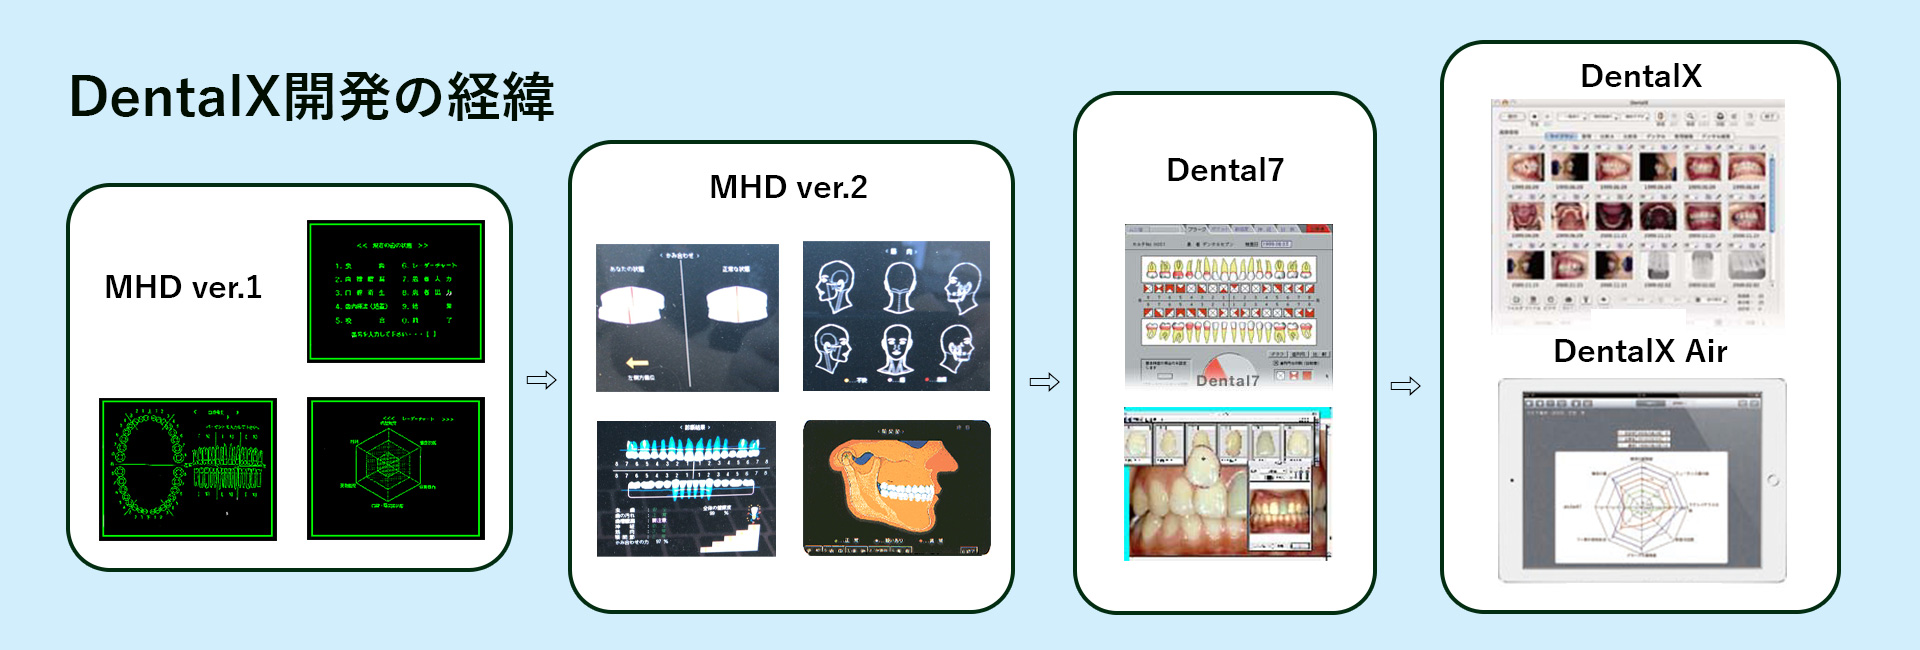 DentalX開発の経緯